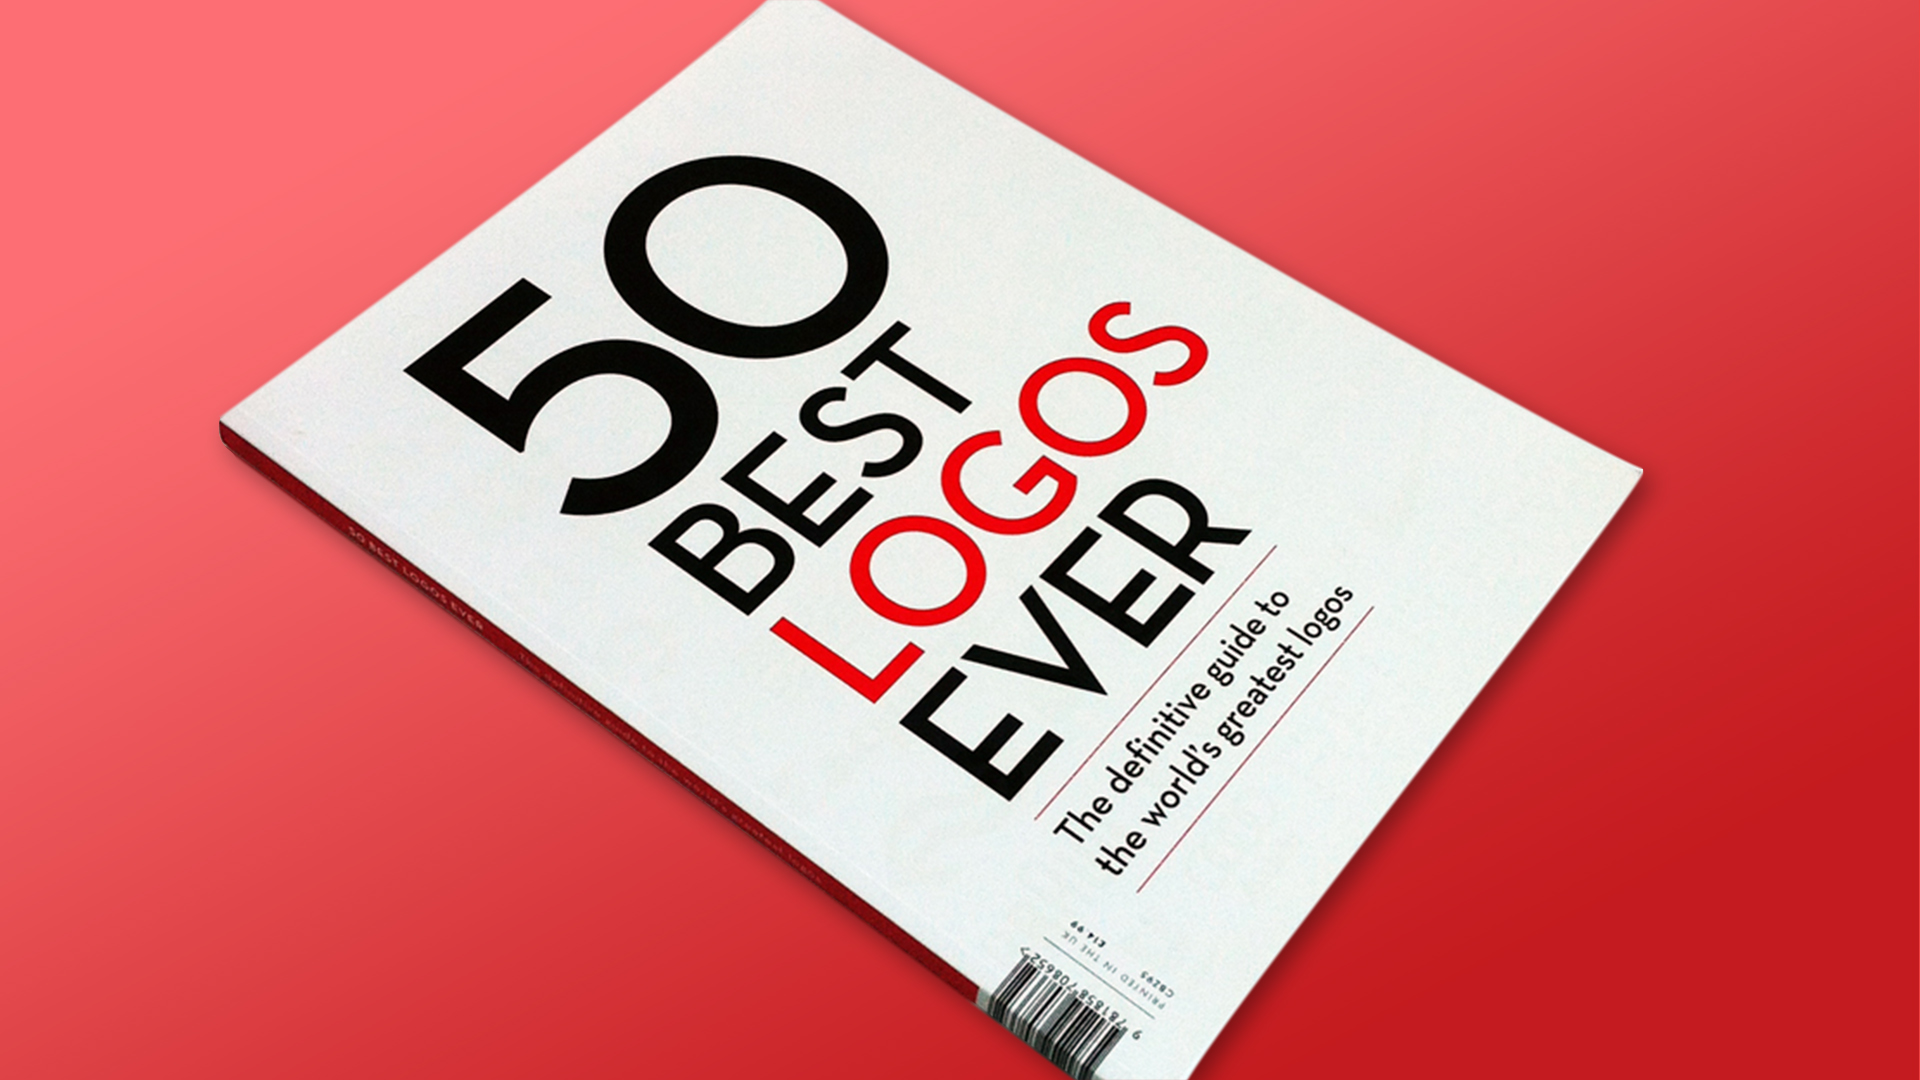 50 best logos ever Graphic Design Book